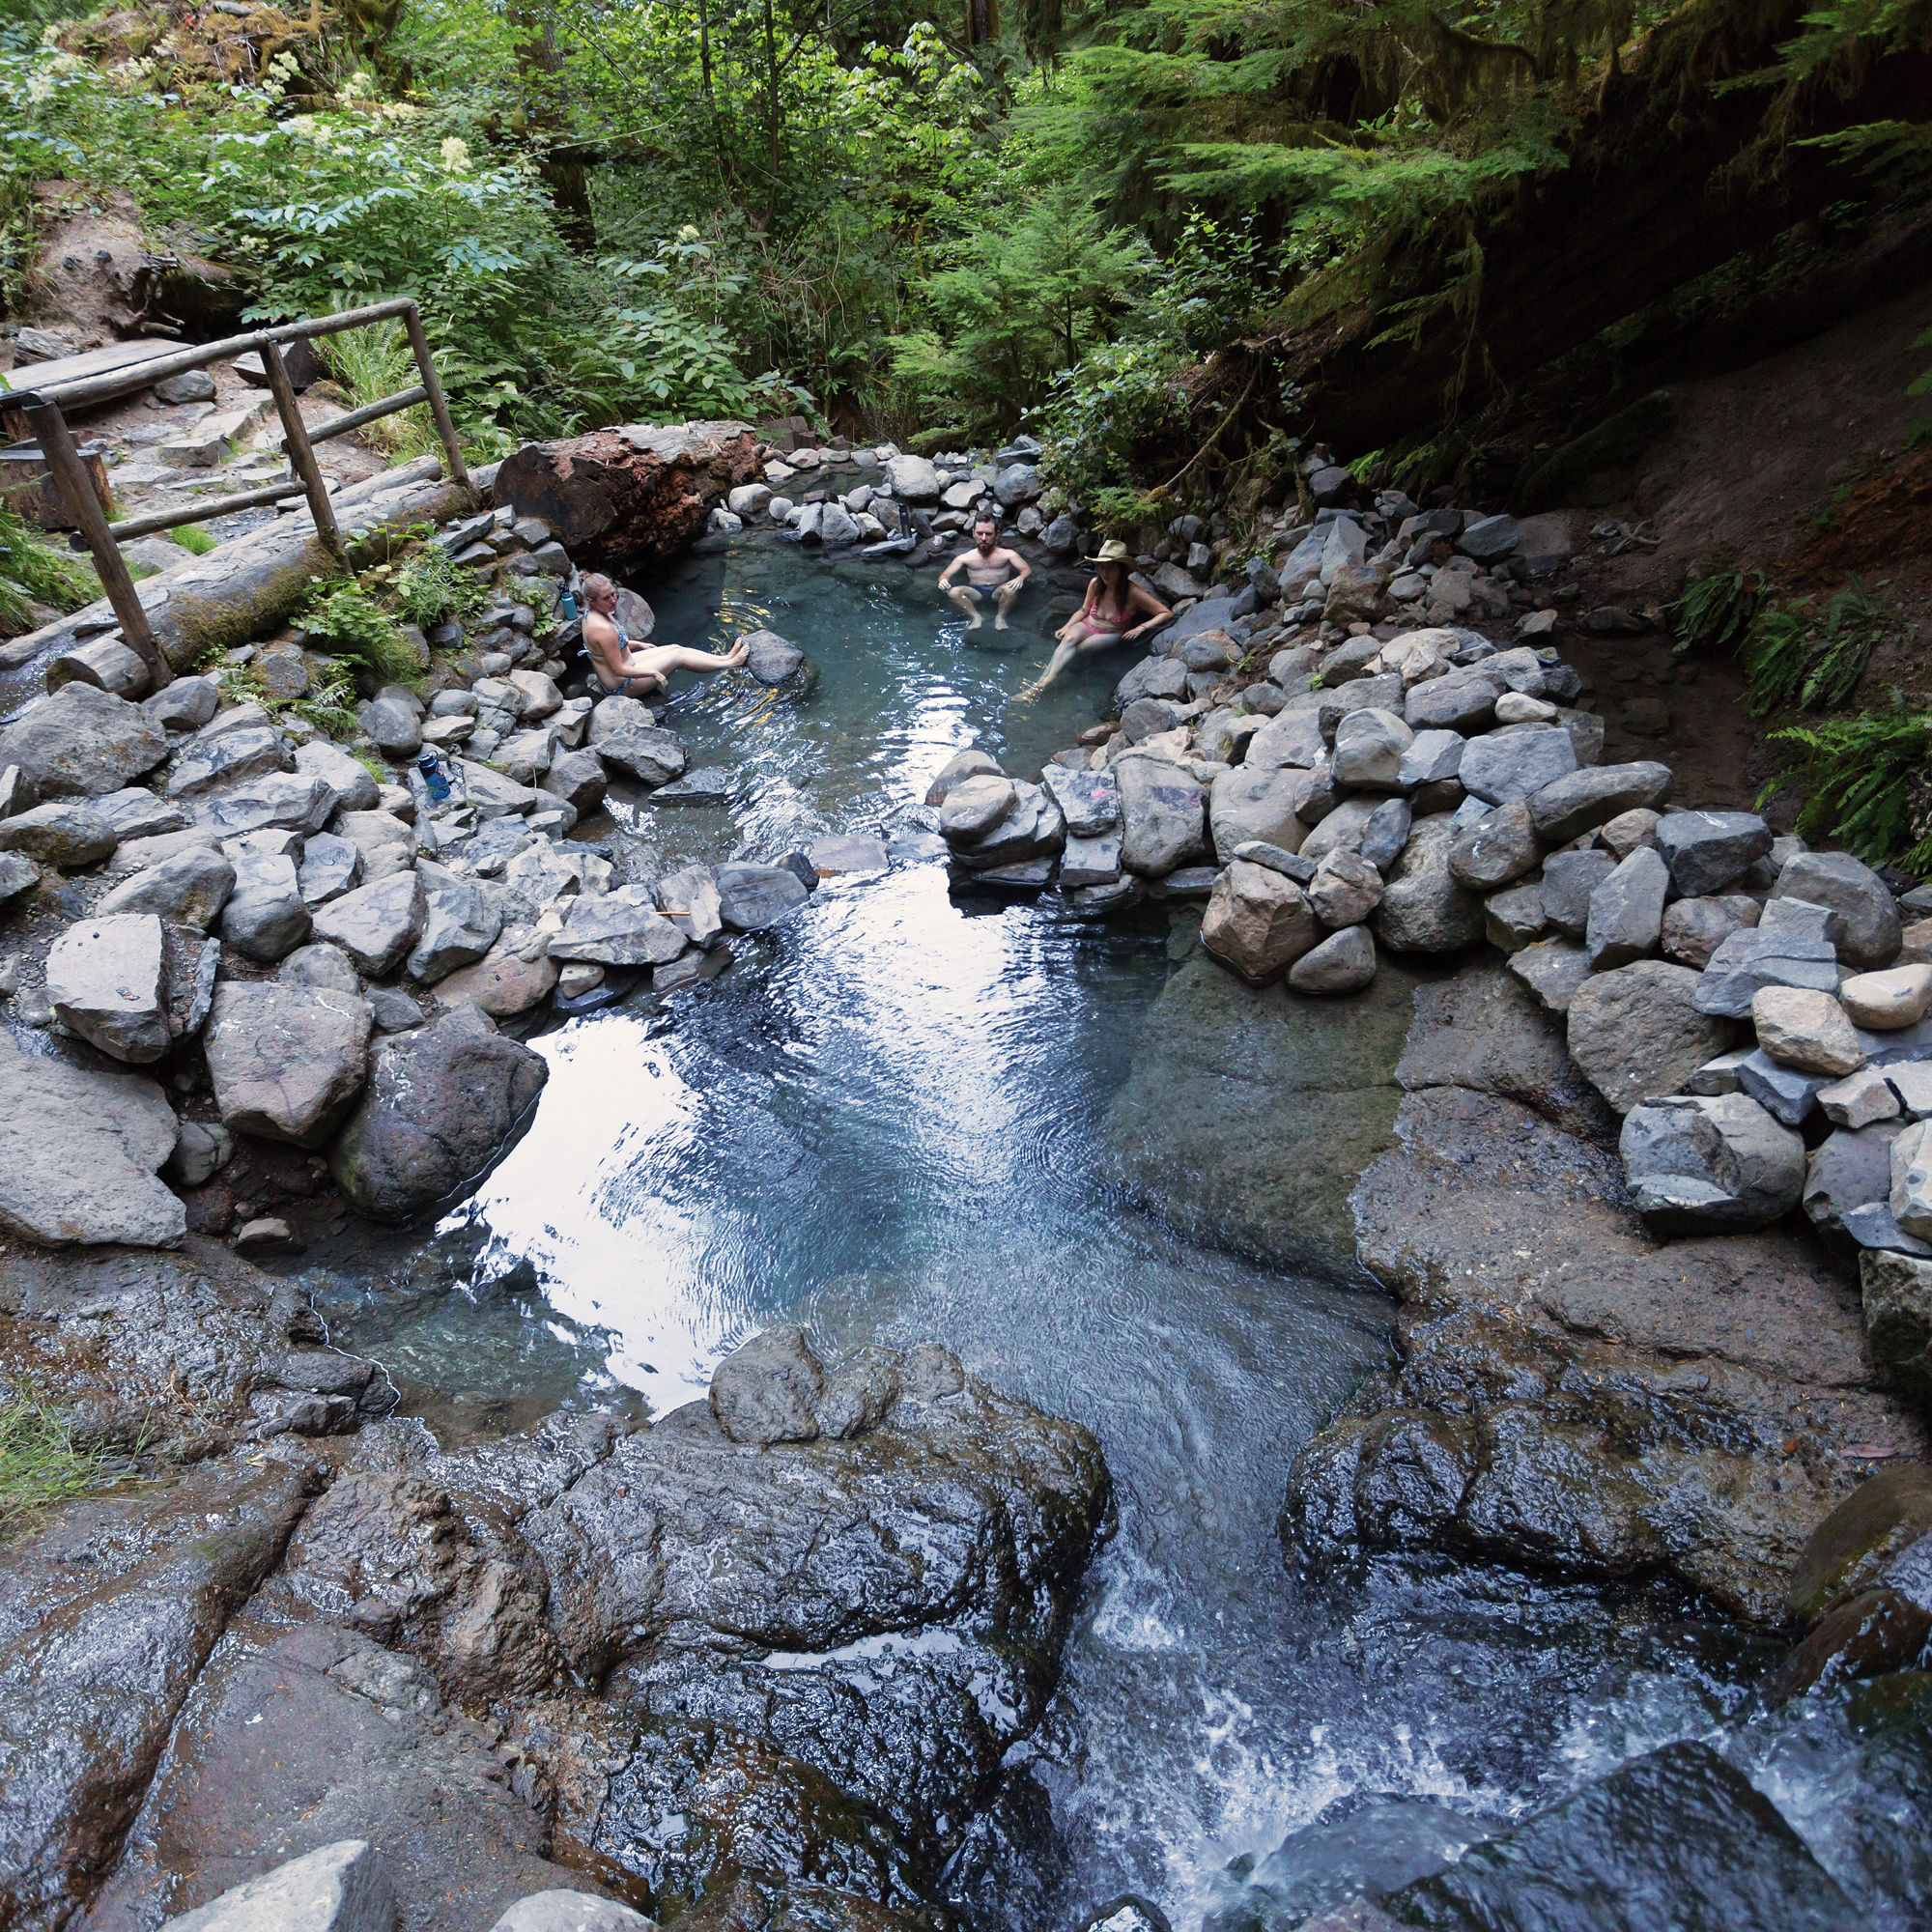 Daniel silverberg seattle met hot springs 46 yykxkr